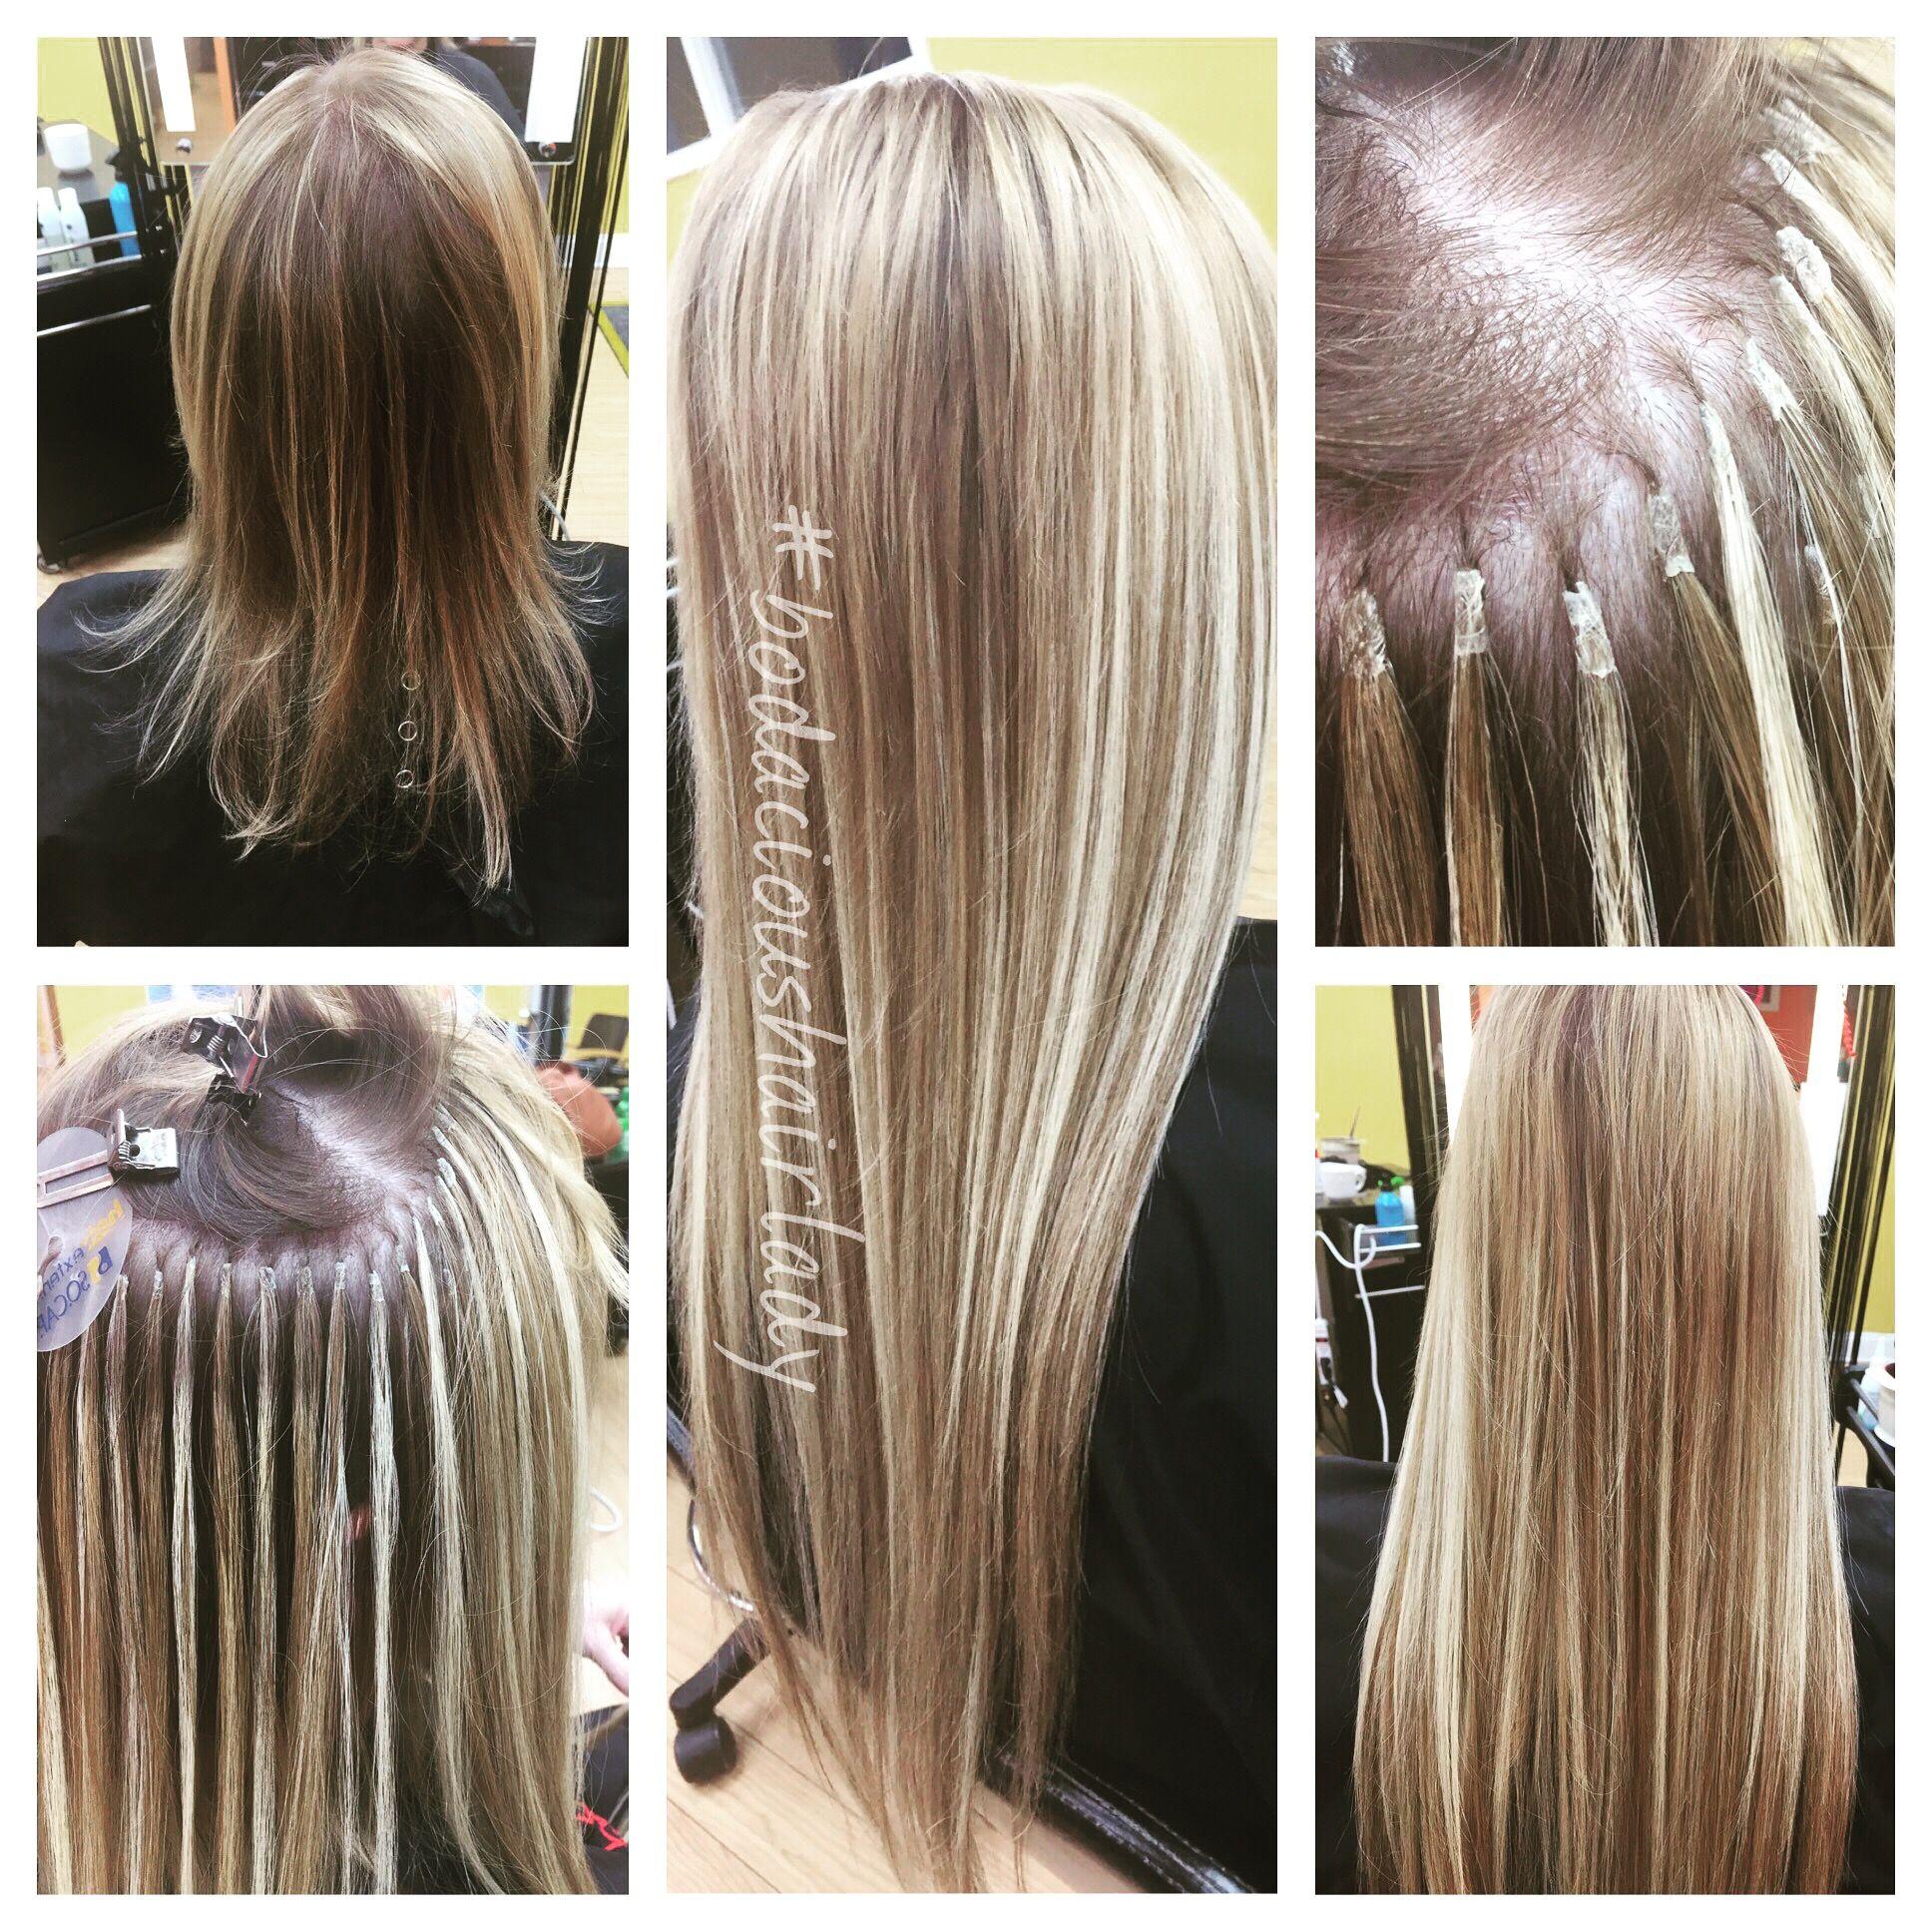 Socap Hair Extensions Fusion Human Hair Keratin Bonds Stylist